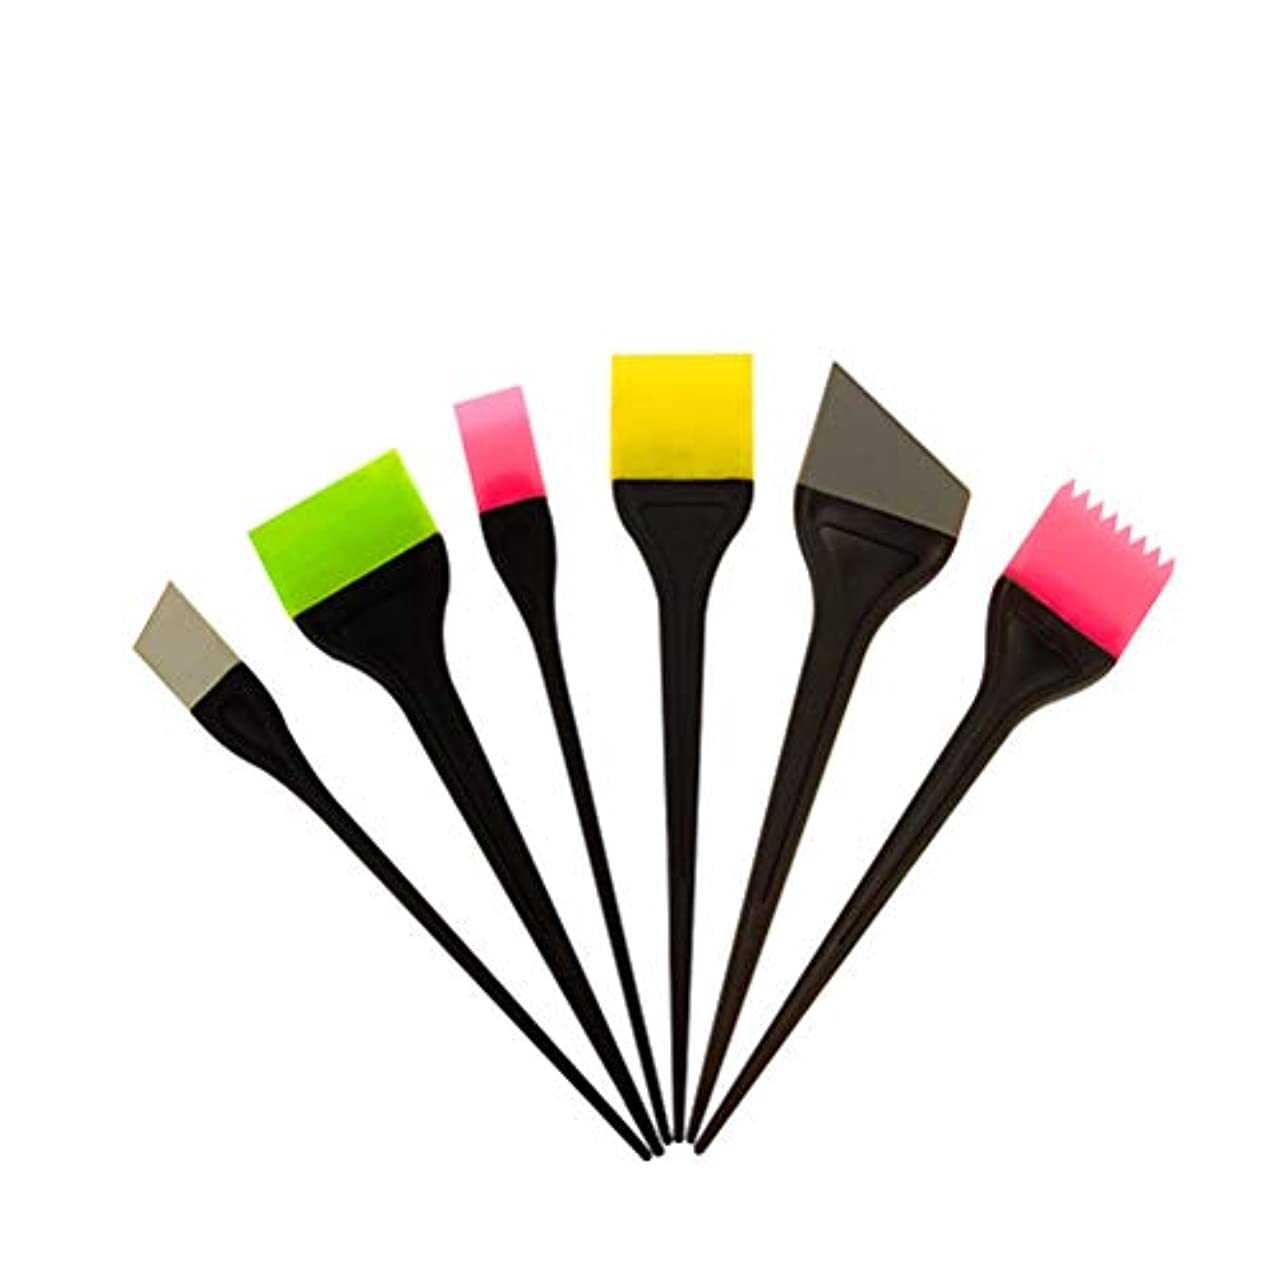 Frcolor ヘアダイブラシ ヘアカラー 毛染め シリコン製 ヘアダイコーム カラーリングブラシ 家庭用 美容師プロ用 6本セット(ランダム色)